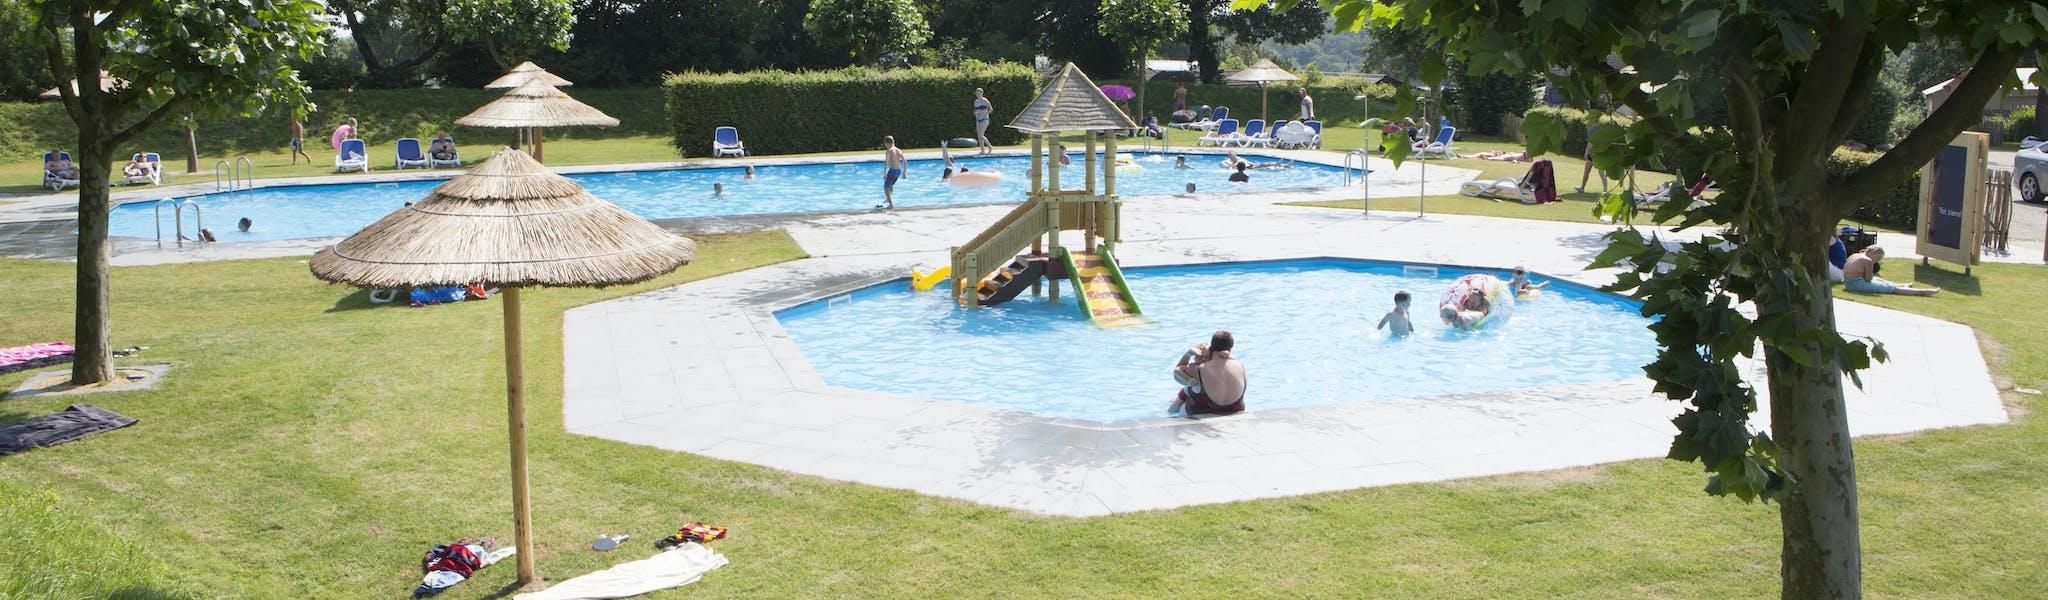 Zwempark camping Gulperberg